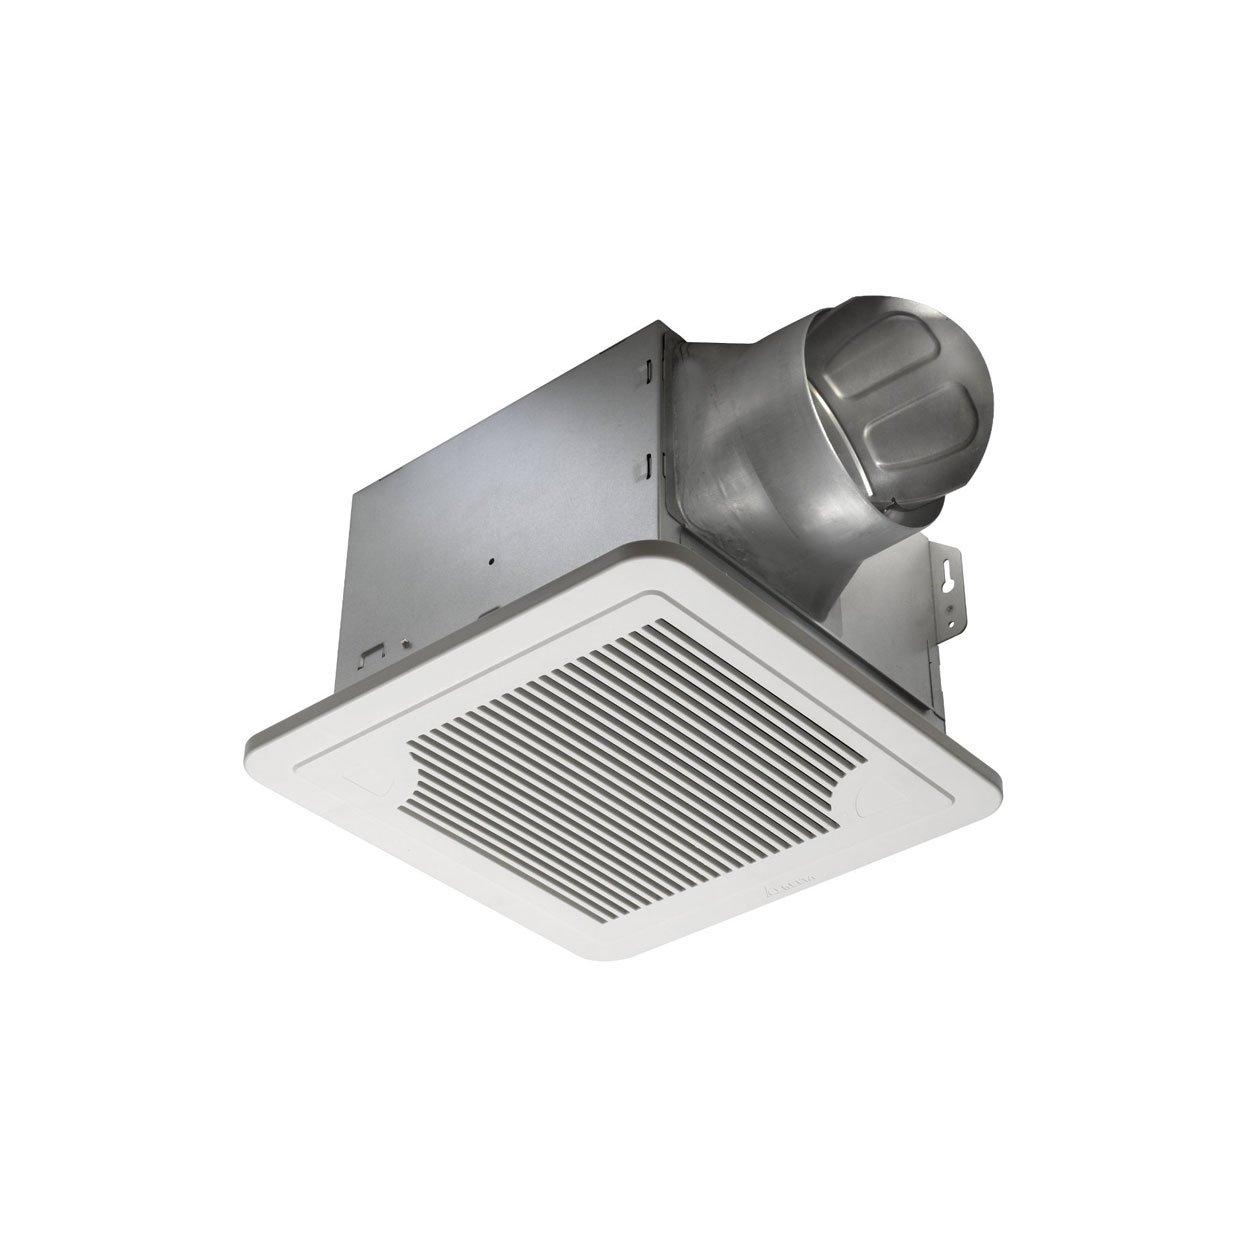 Delta BreezSmart SMT130H 130 CFM Exhaust Fan with Adjustable Humidity Sensor and Speed Control